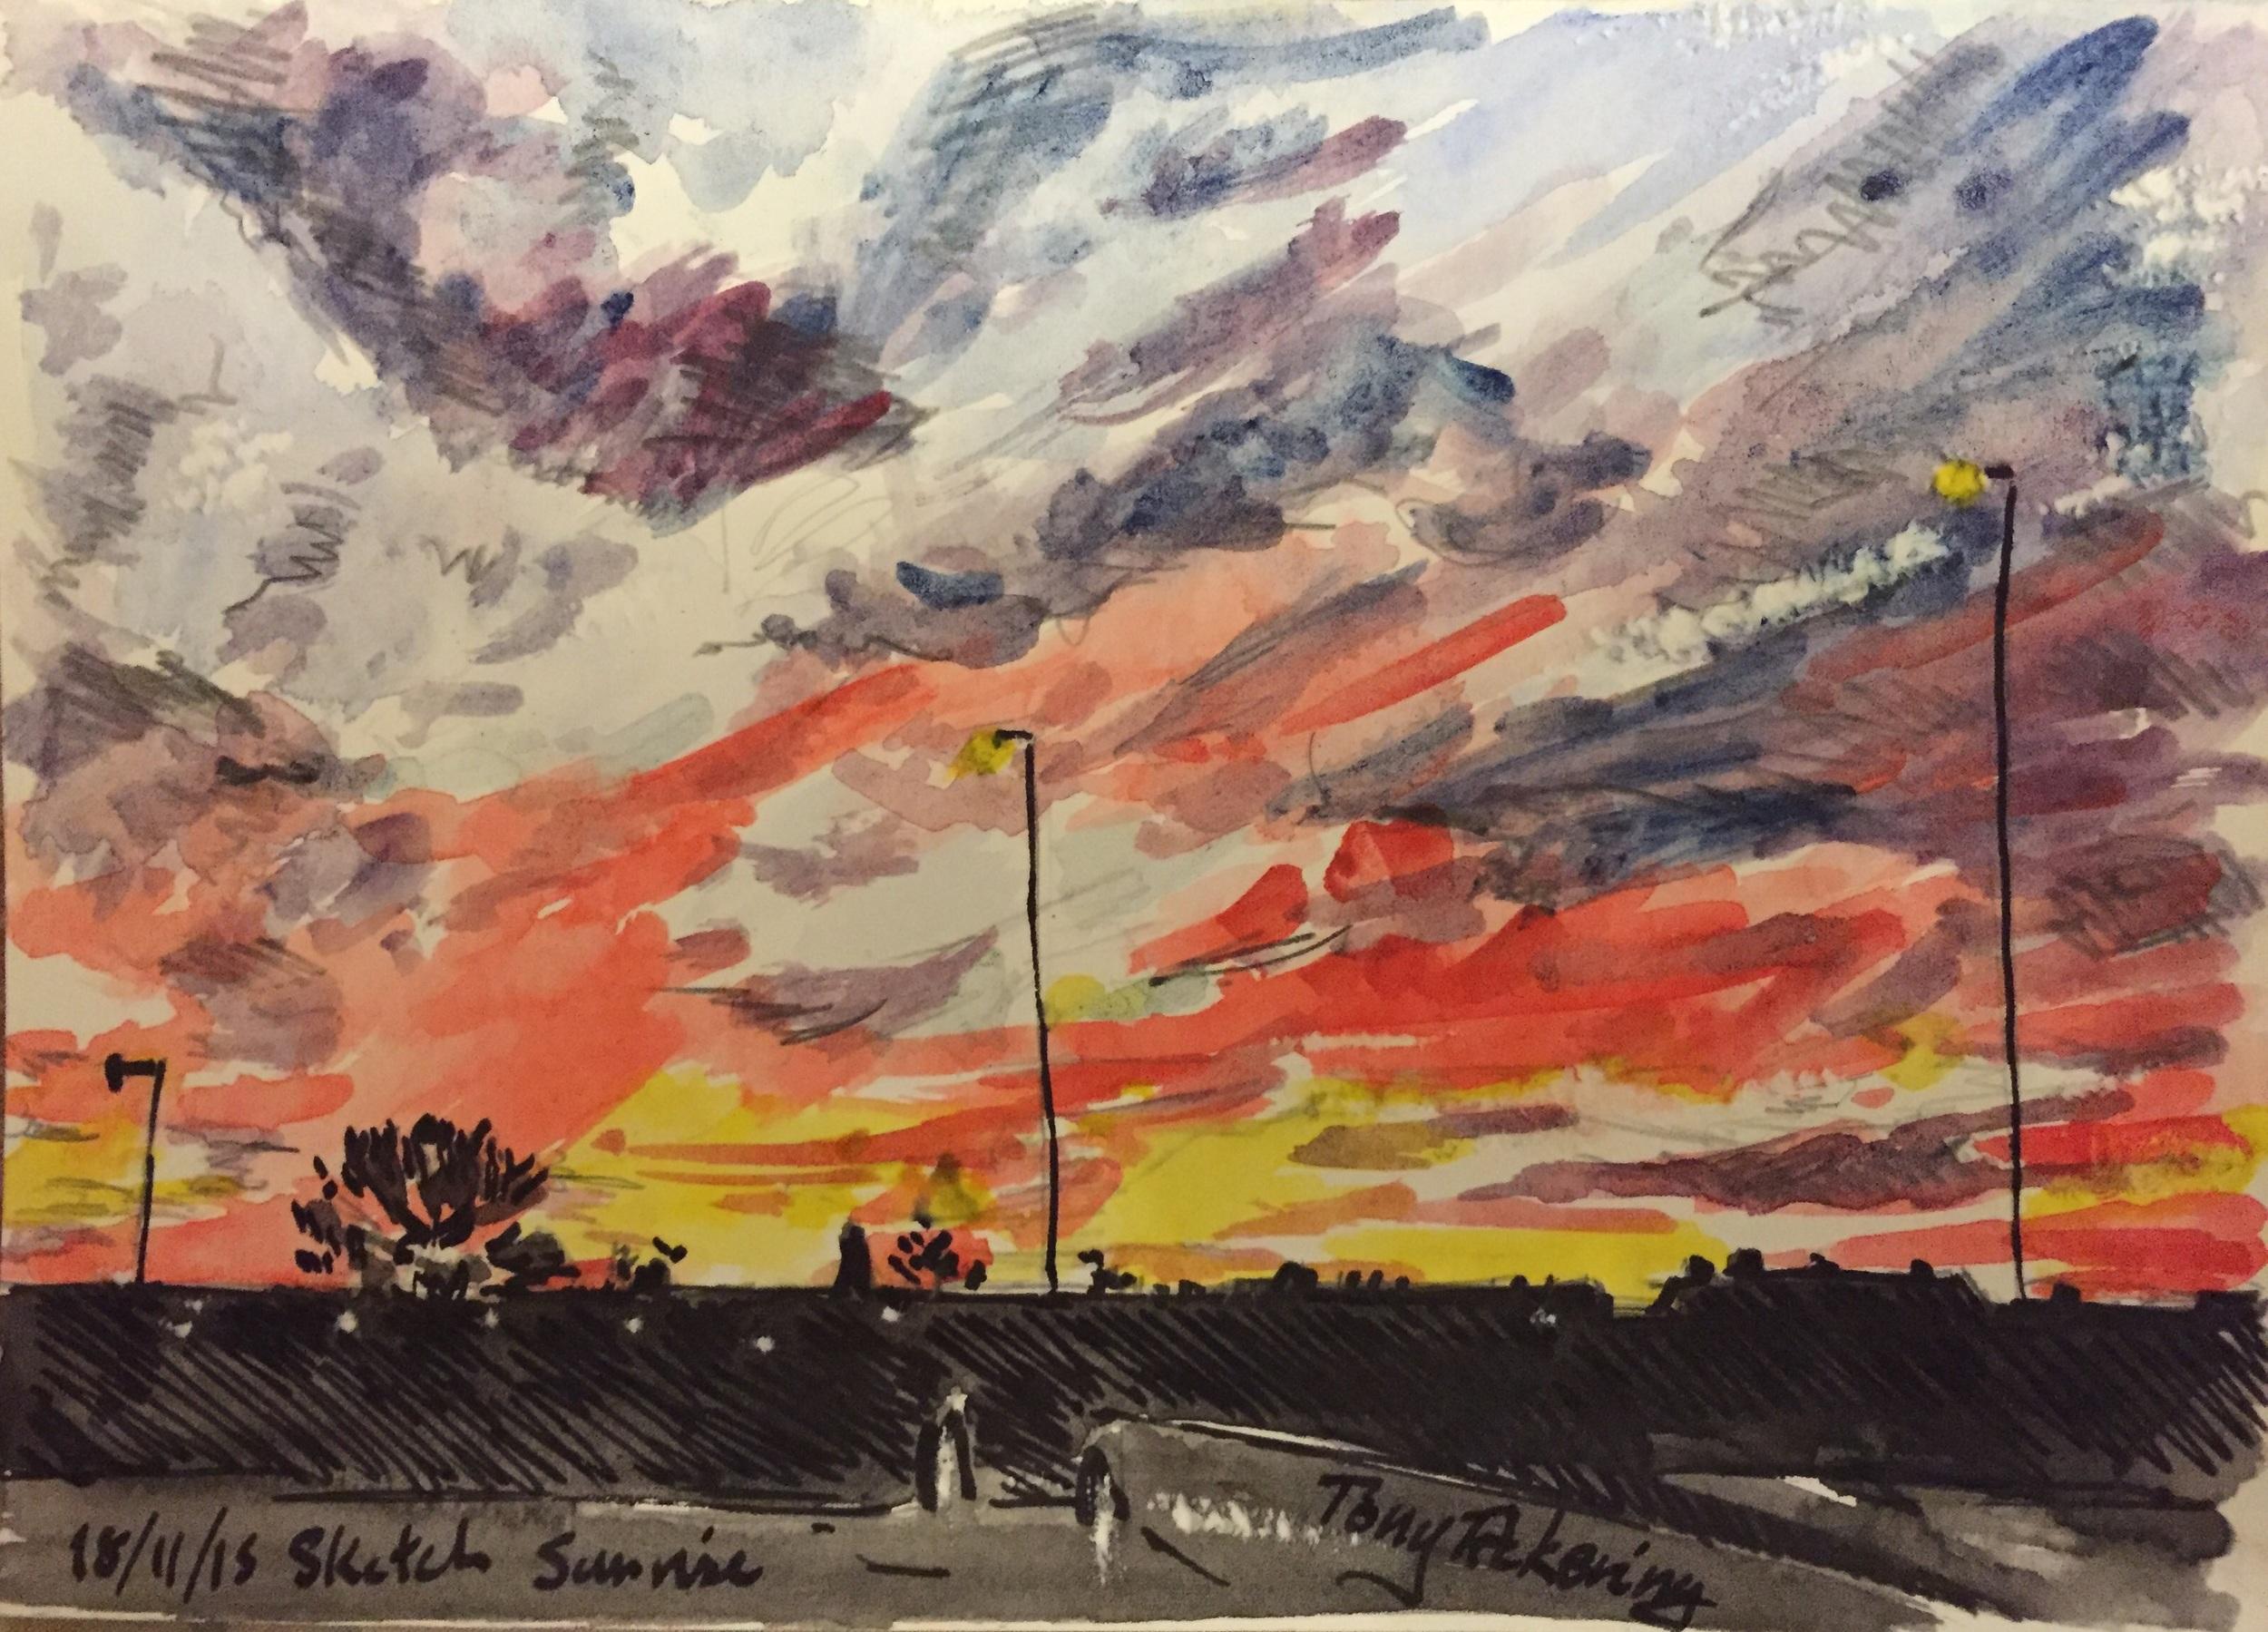 """Sunrise sketch""."